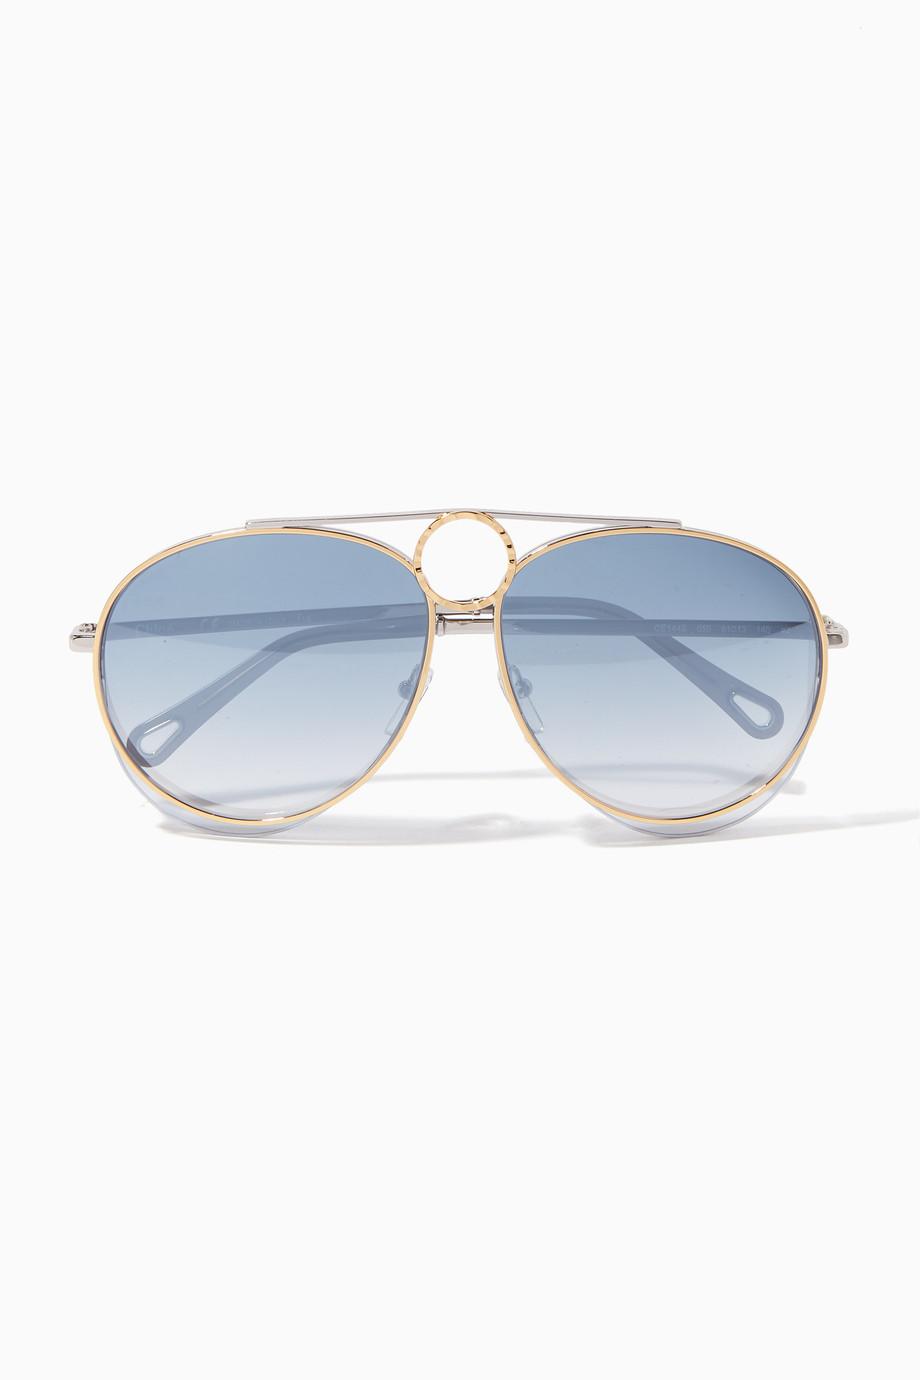 b4df7287588 Shop Chloé Blue Blue Degrade Romie Aviator Suglassses for Women ...